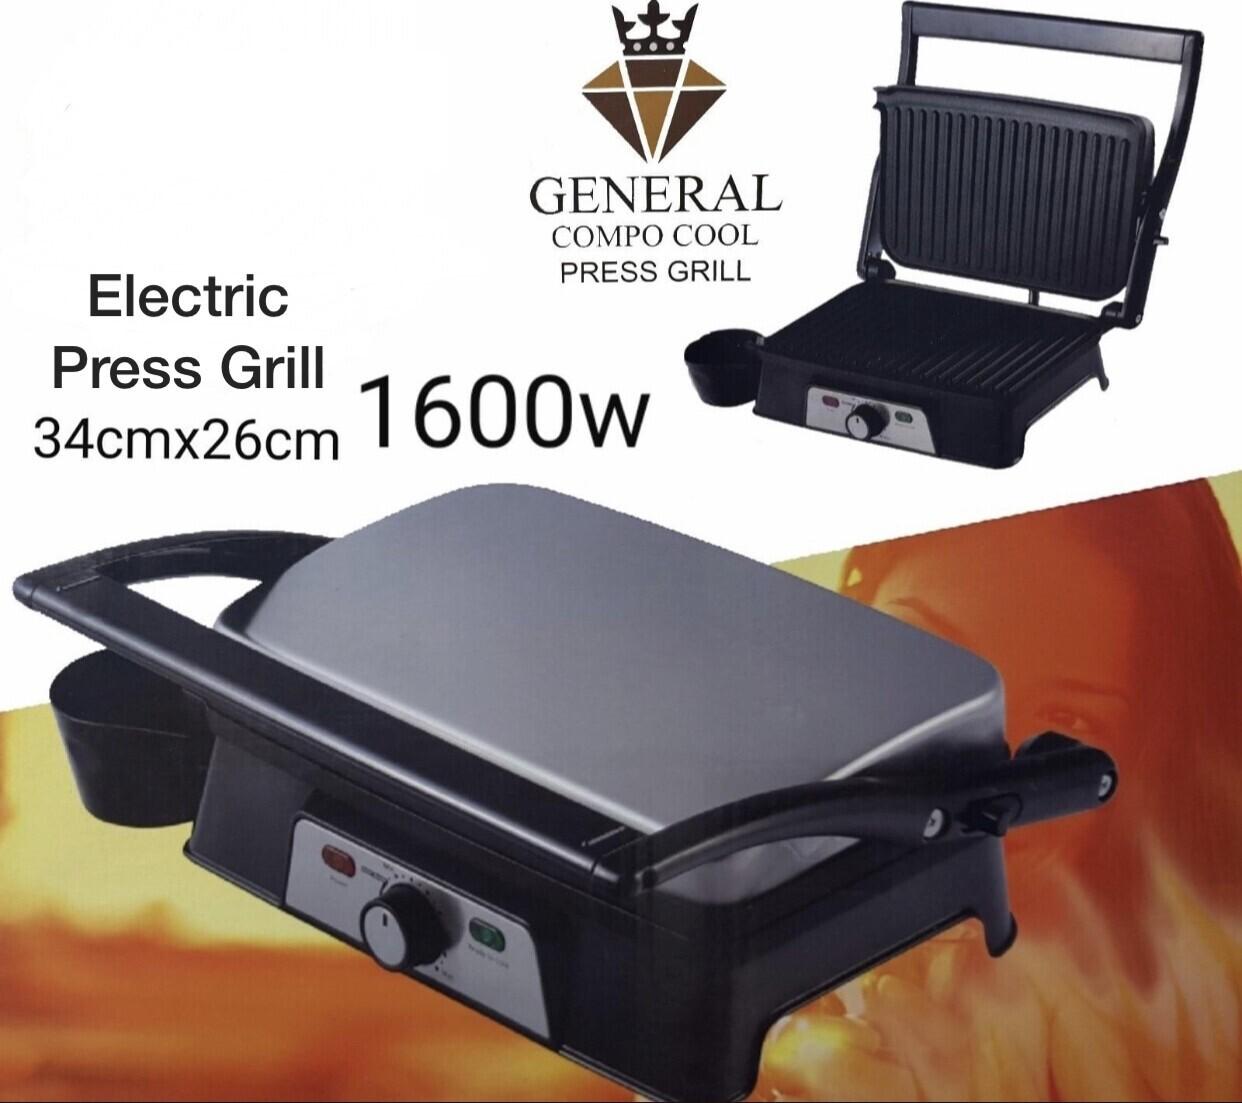 Electric Press Grill